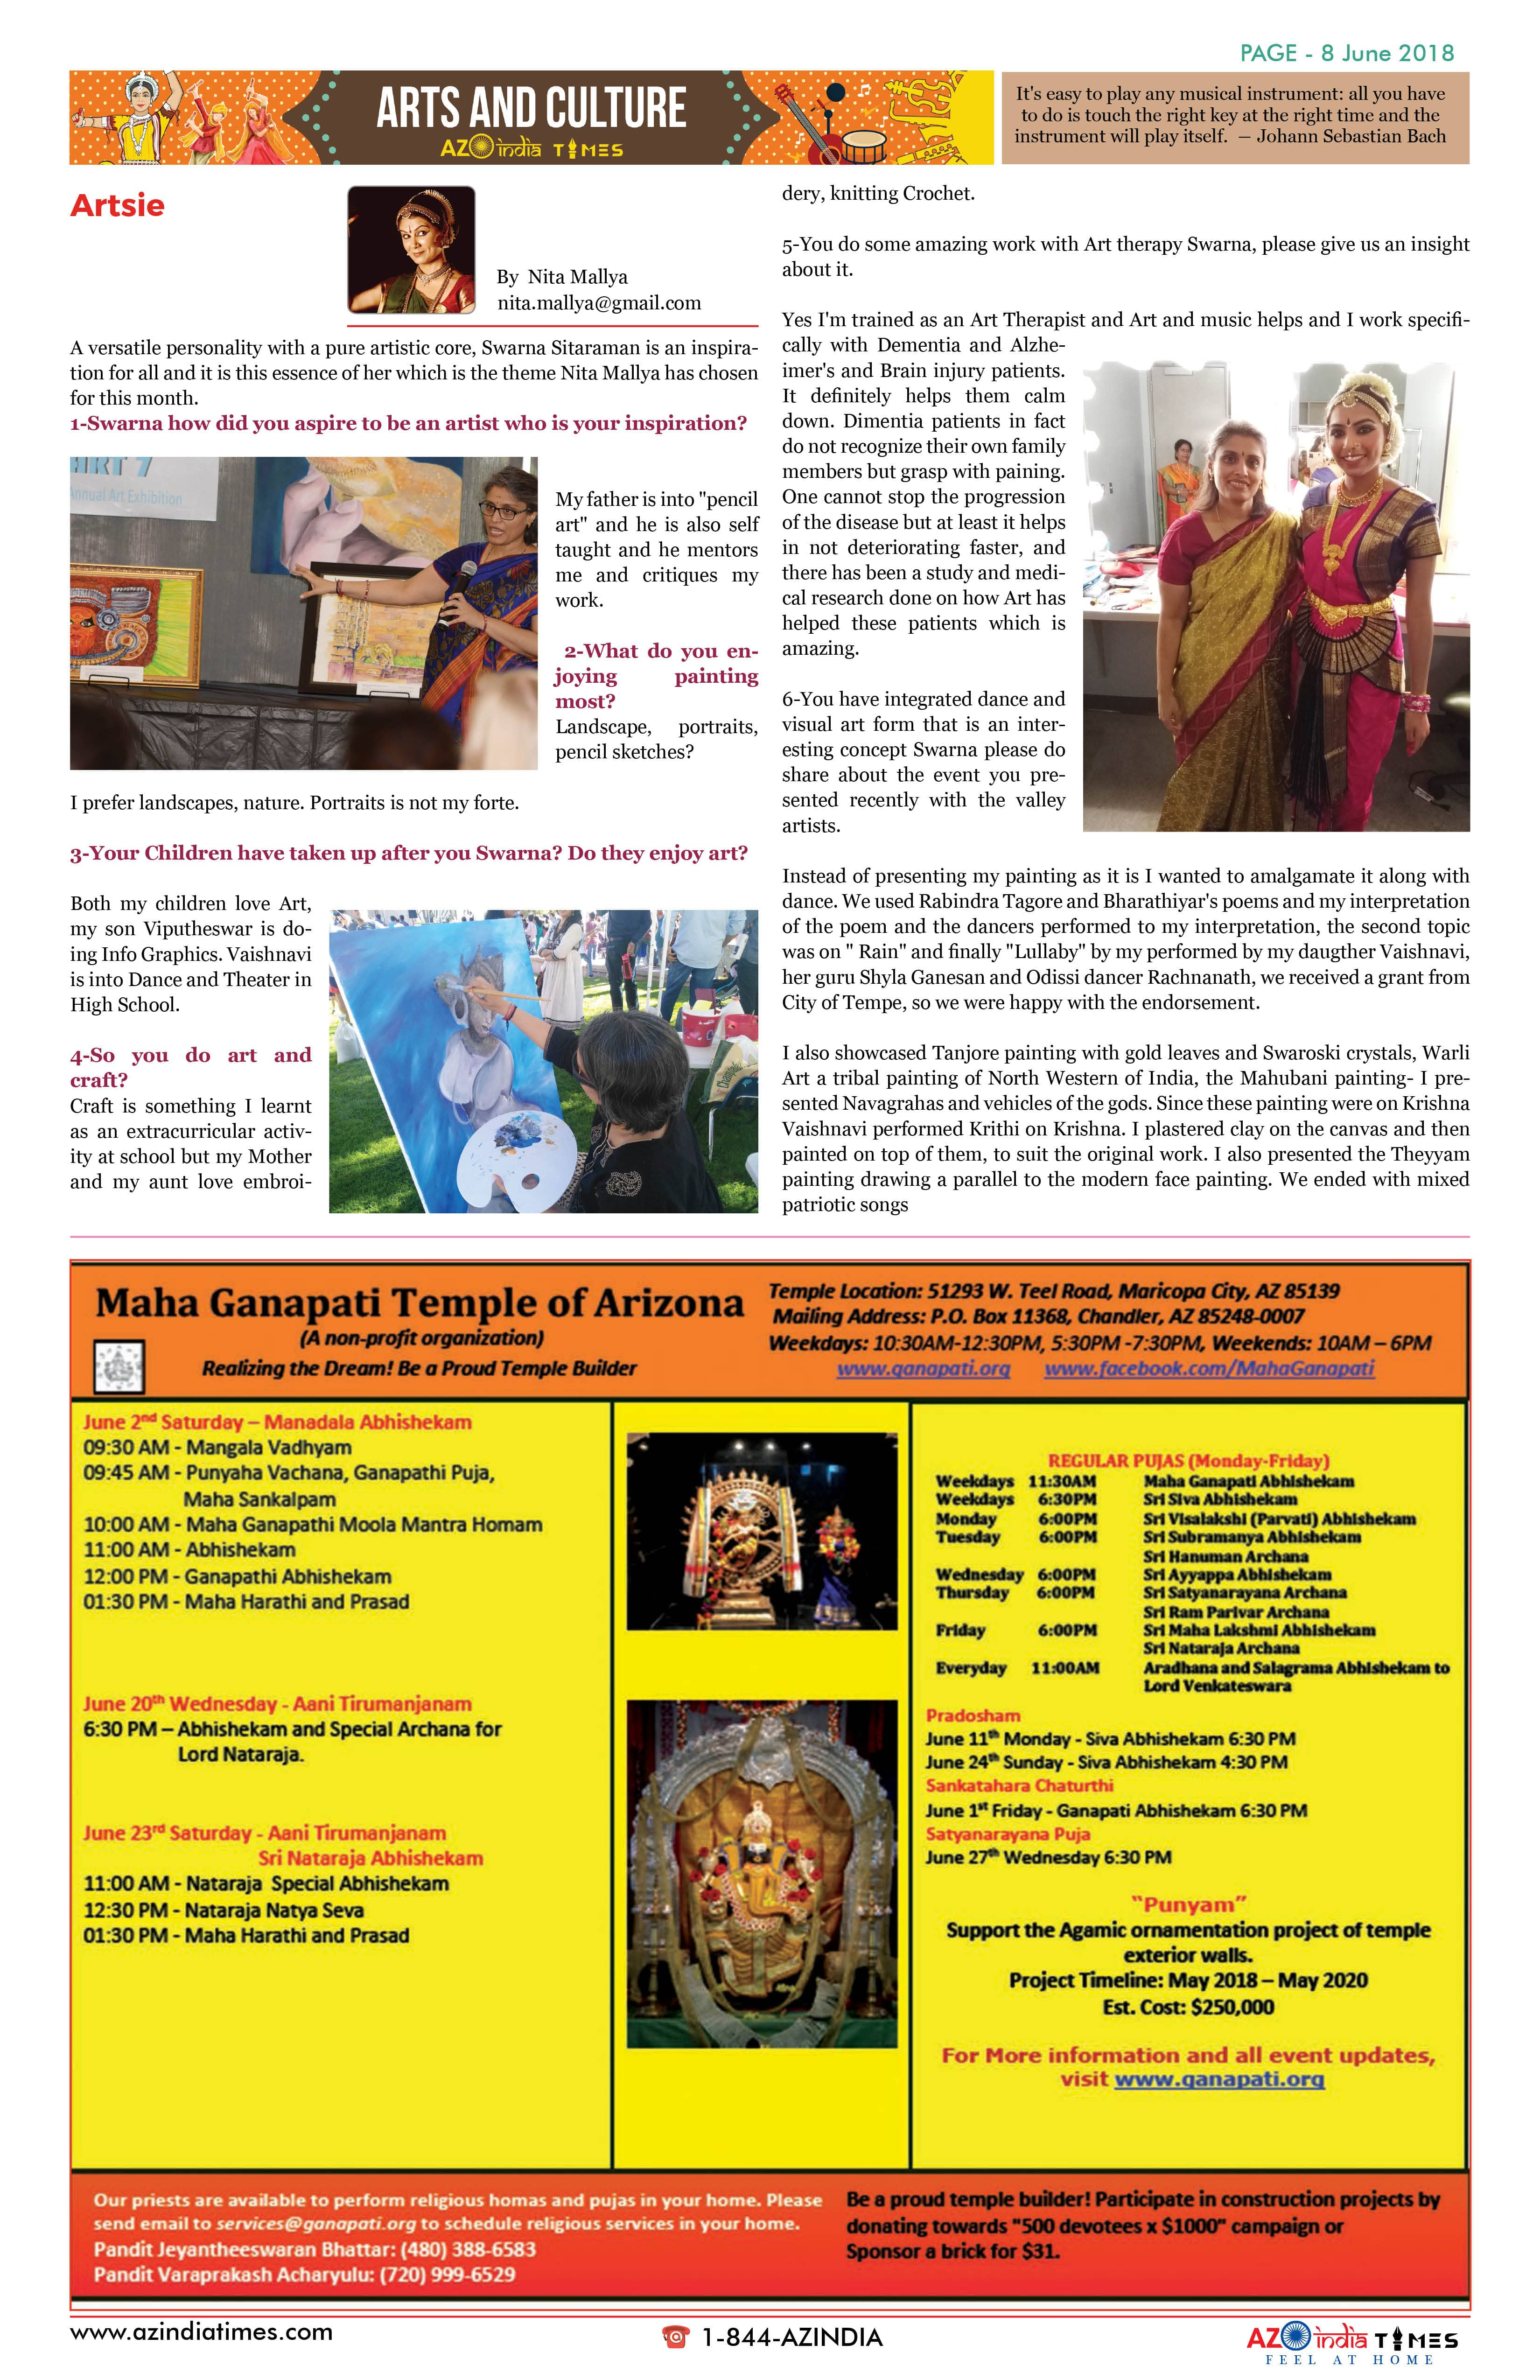 AZ INDIA JUNE EDITION 8